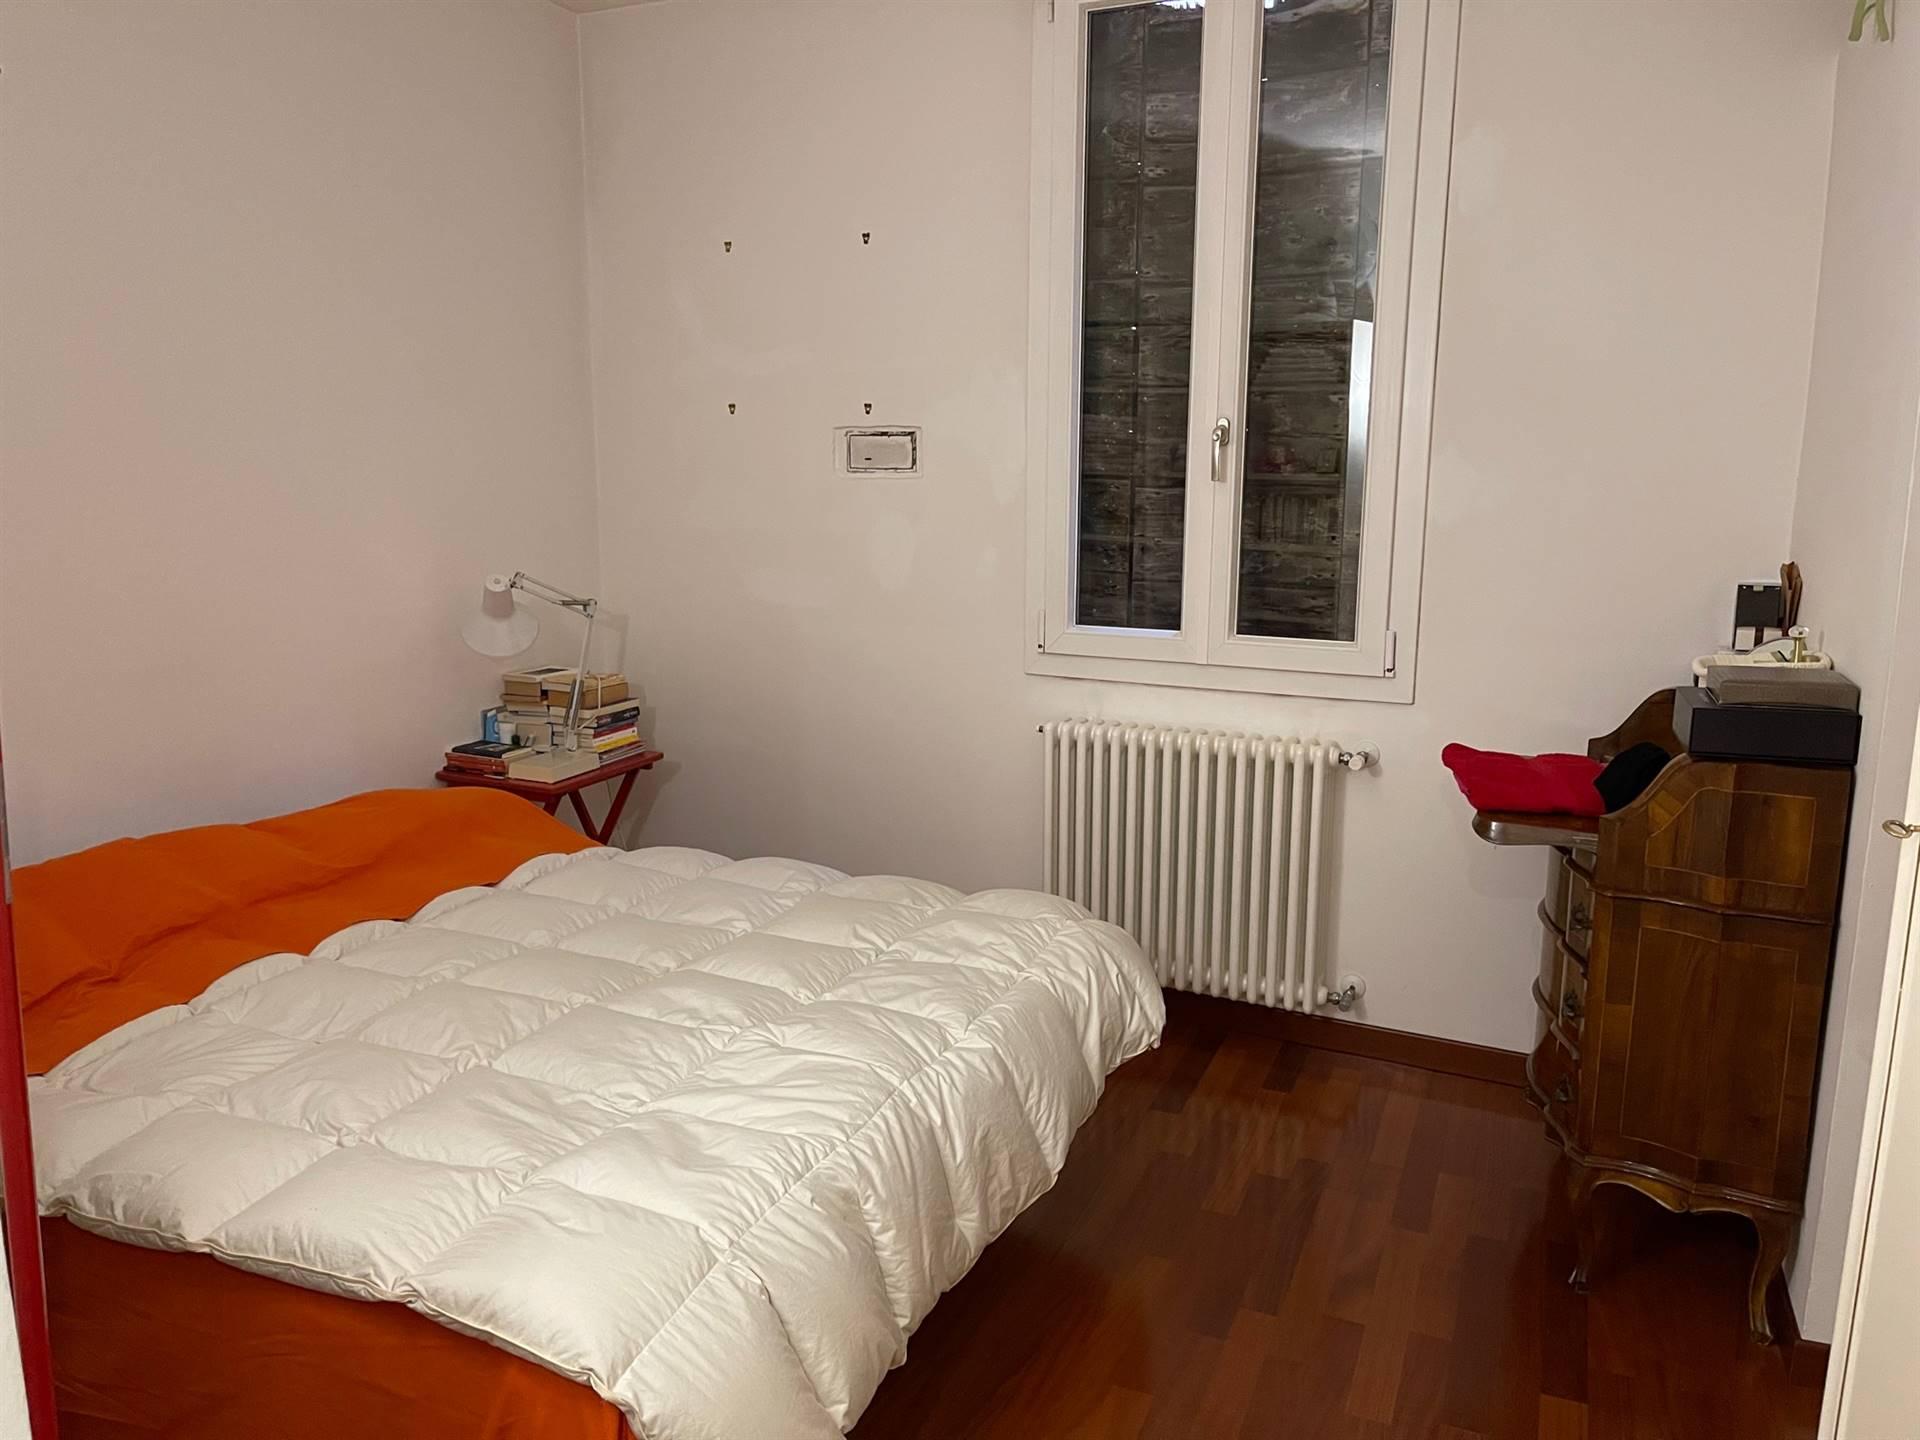 camera appartamento Venezia rif. 559 V 21